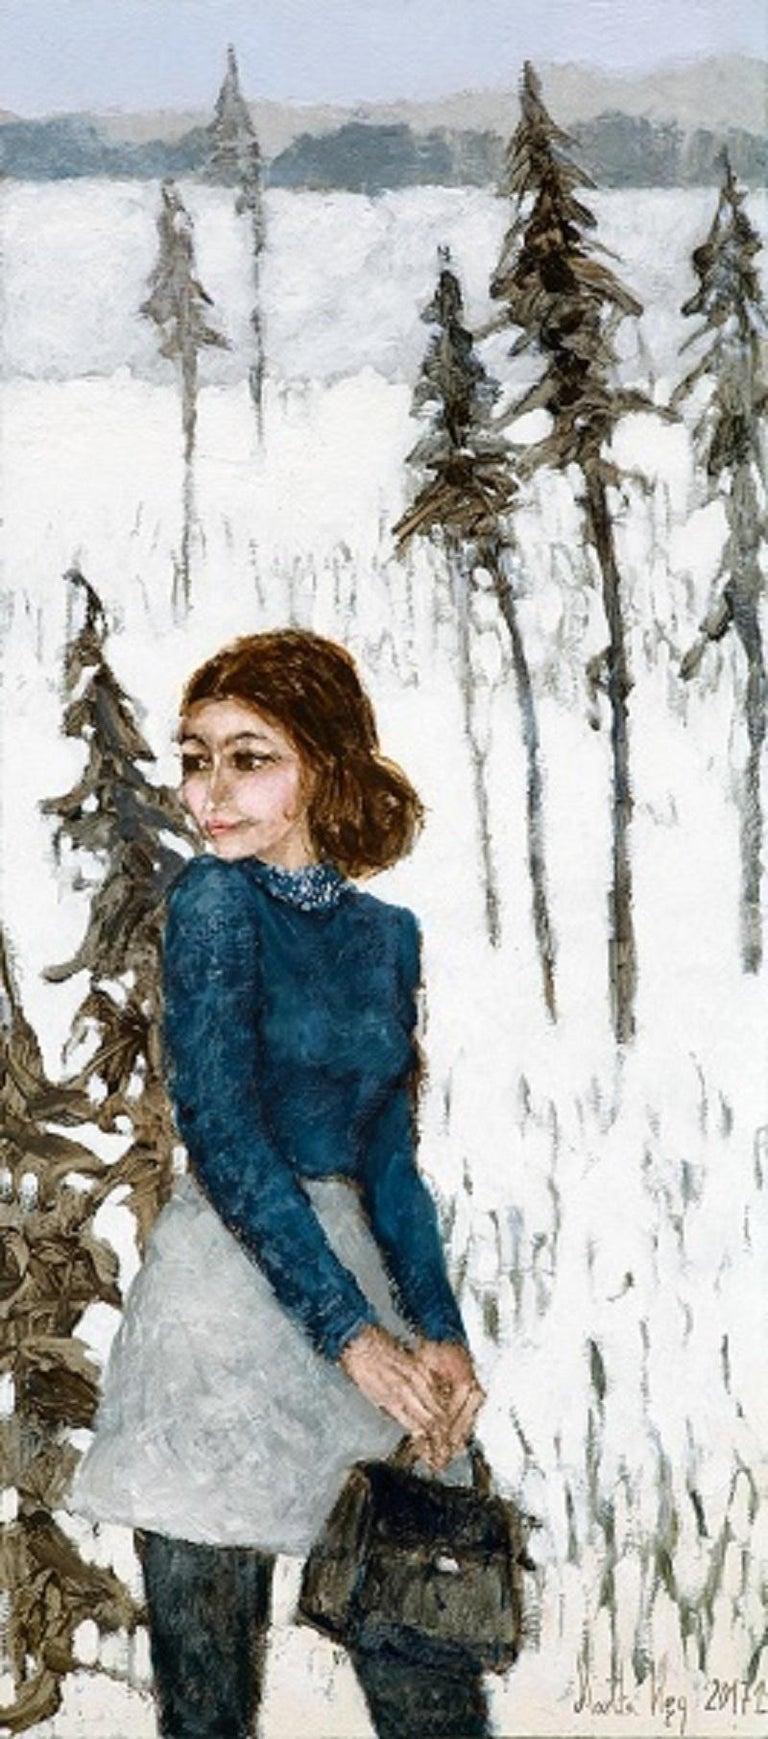 Martta Węg Figurative Painting - Trip to Beskidy II - XXI century, Oil figurative painting, Colourful, Landscape